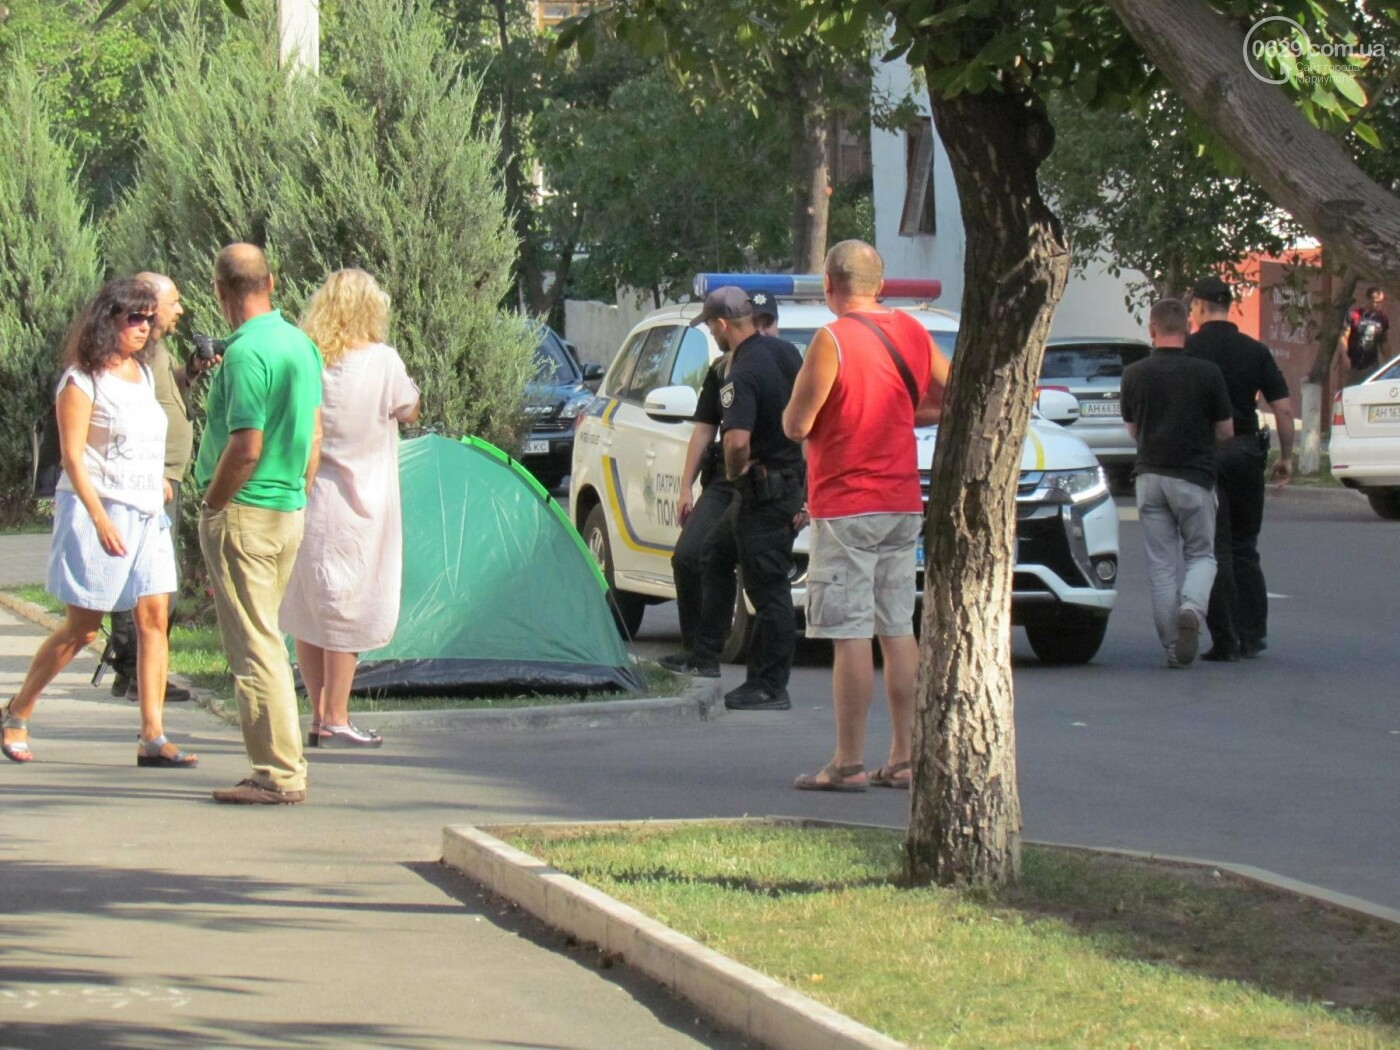 Мариупольчанка объявила голодовку за Сенцова, за квартиру от мэрии и против коррупции - ФОТО, фото-4